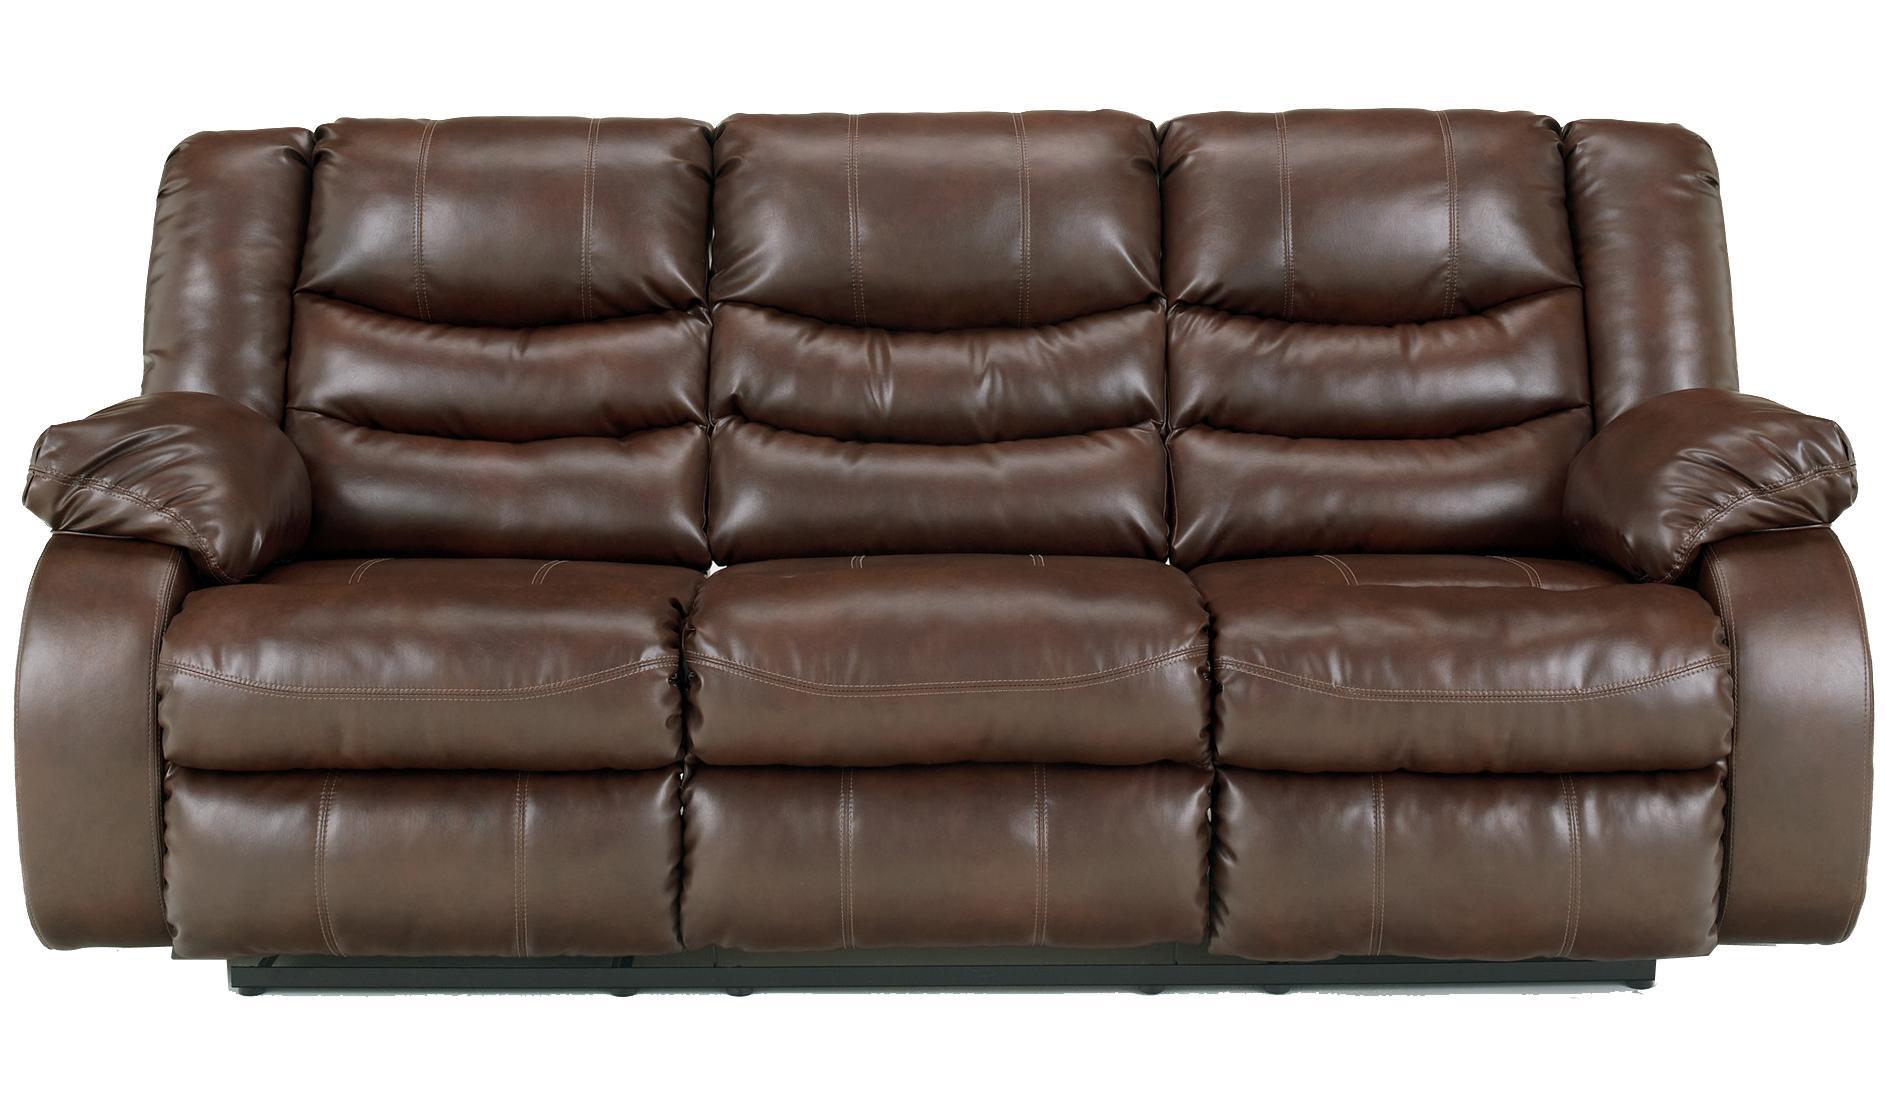 Benchcraft Linebacker DuraBlend - Espresso Reclining Sofa - Item Number: 9520188